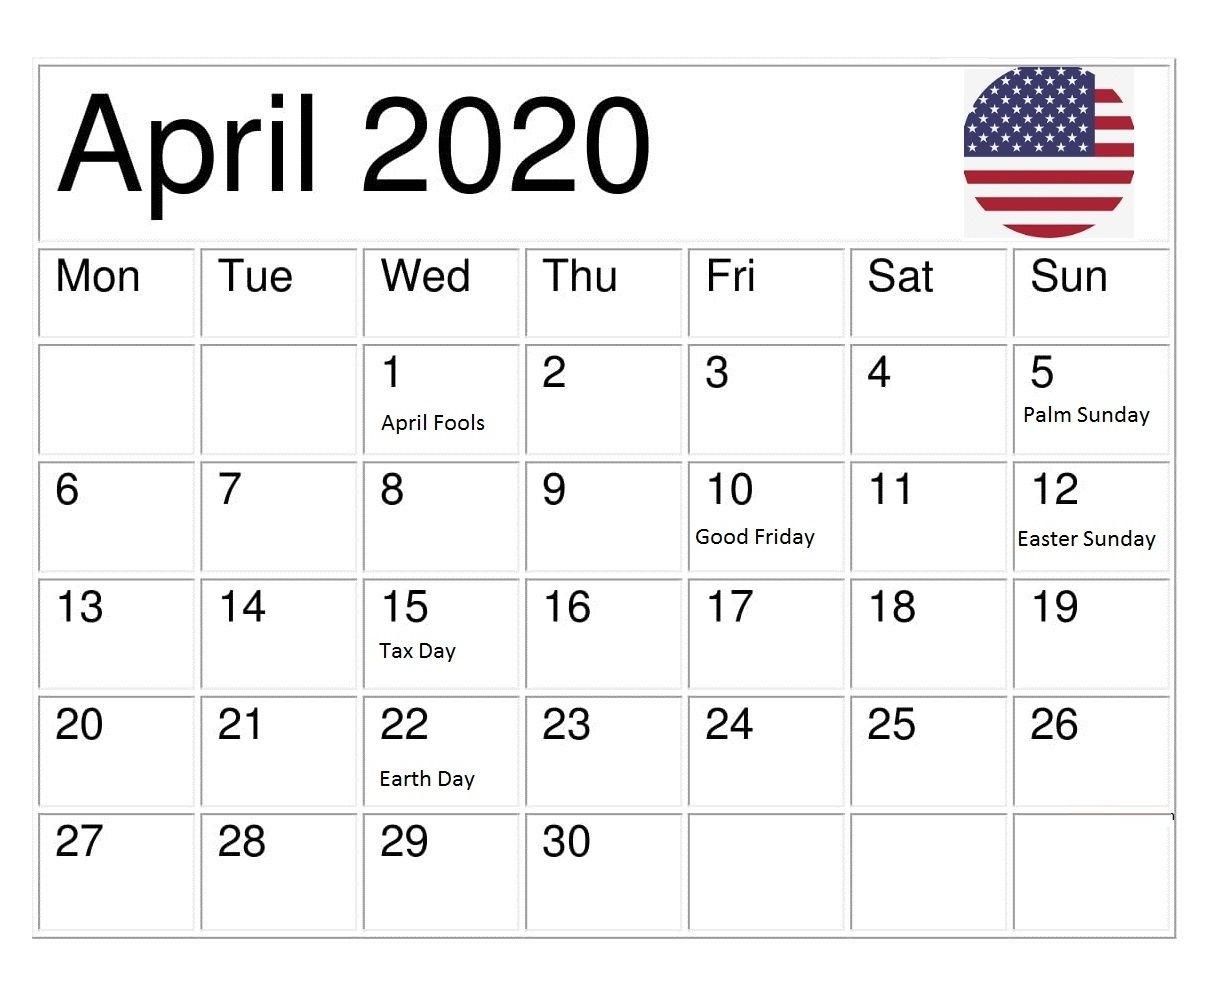 Usa April 2020 Holidays Calendar In 2020 | Holiday Calendar